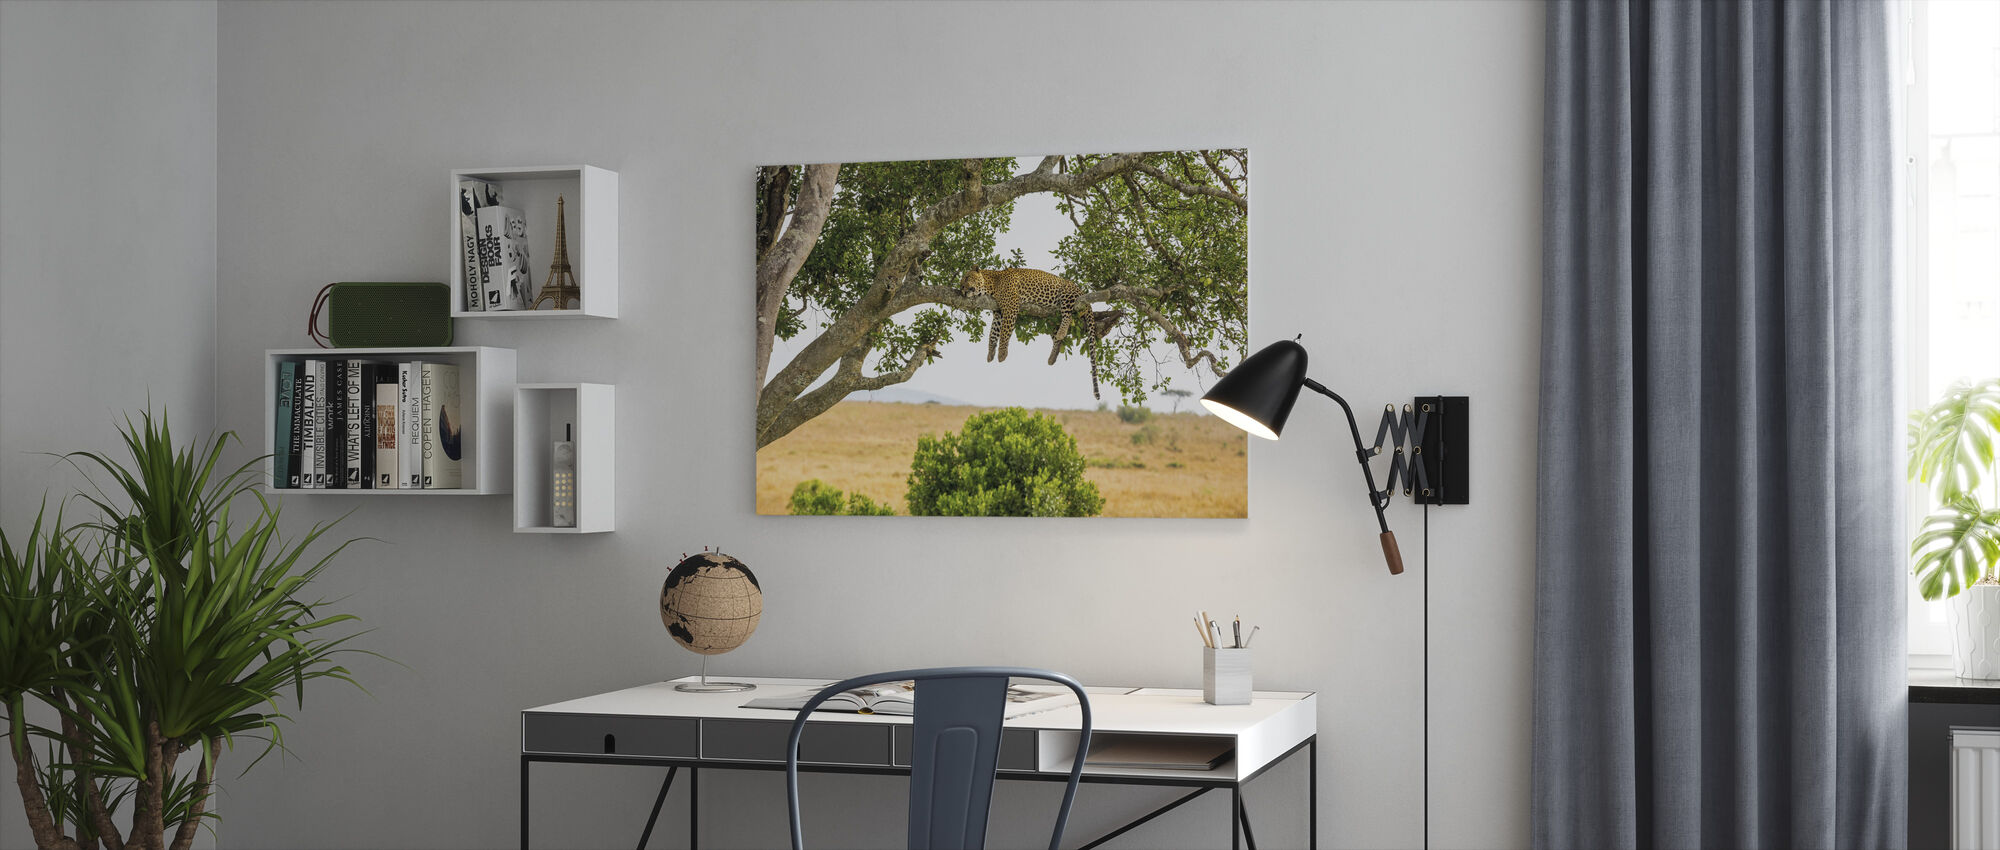 Leopard Sleeping in Tree - Canvas print - Office